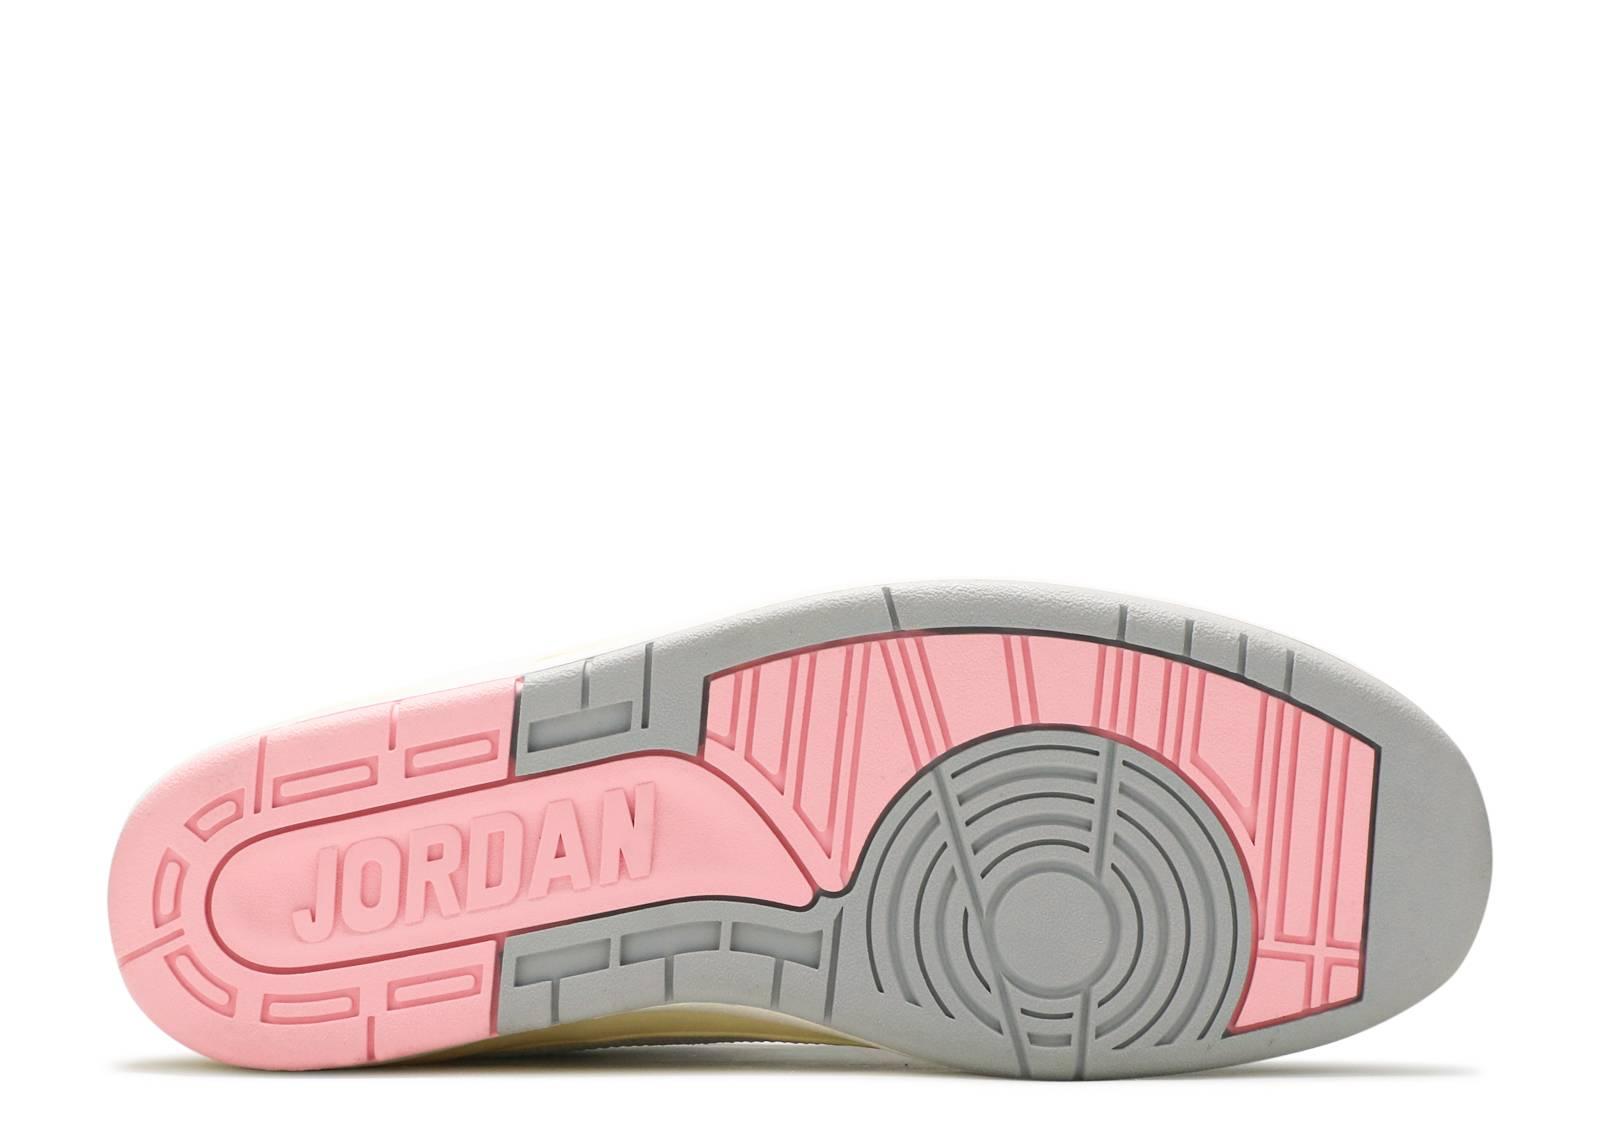 the latest e4776 9b574 W s Air Jordan 2 Retro Low - Air Jordan - 311648 103 - white light steel  grey-rl pink   Flight Club